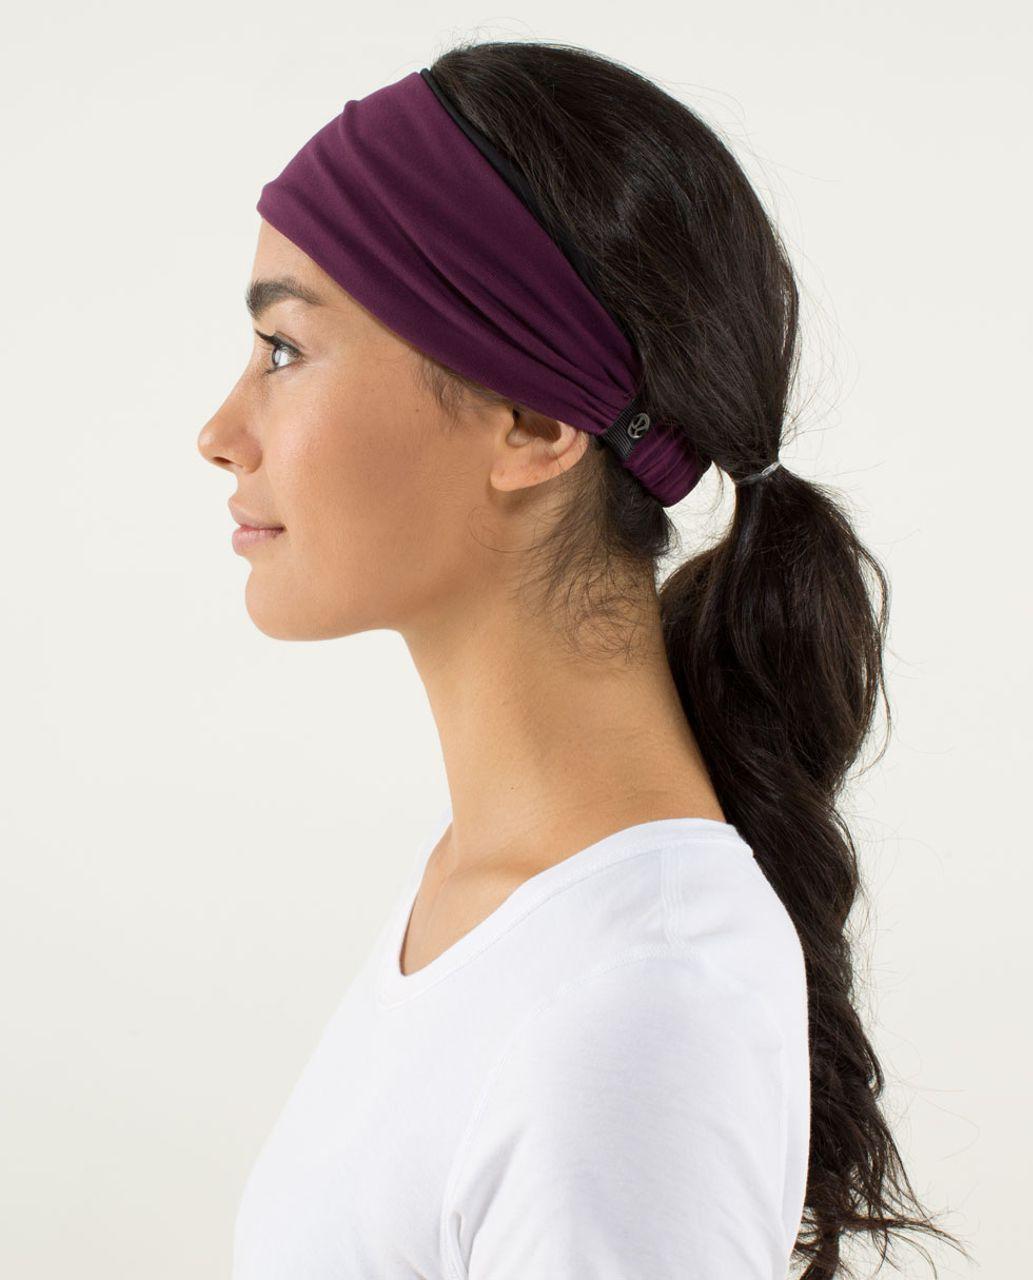 Lululemon Bang Buster Headband *Reversible - Plum / Black